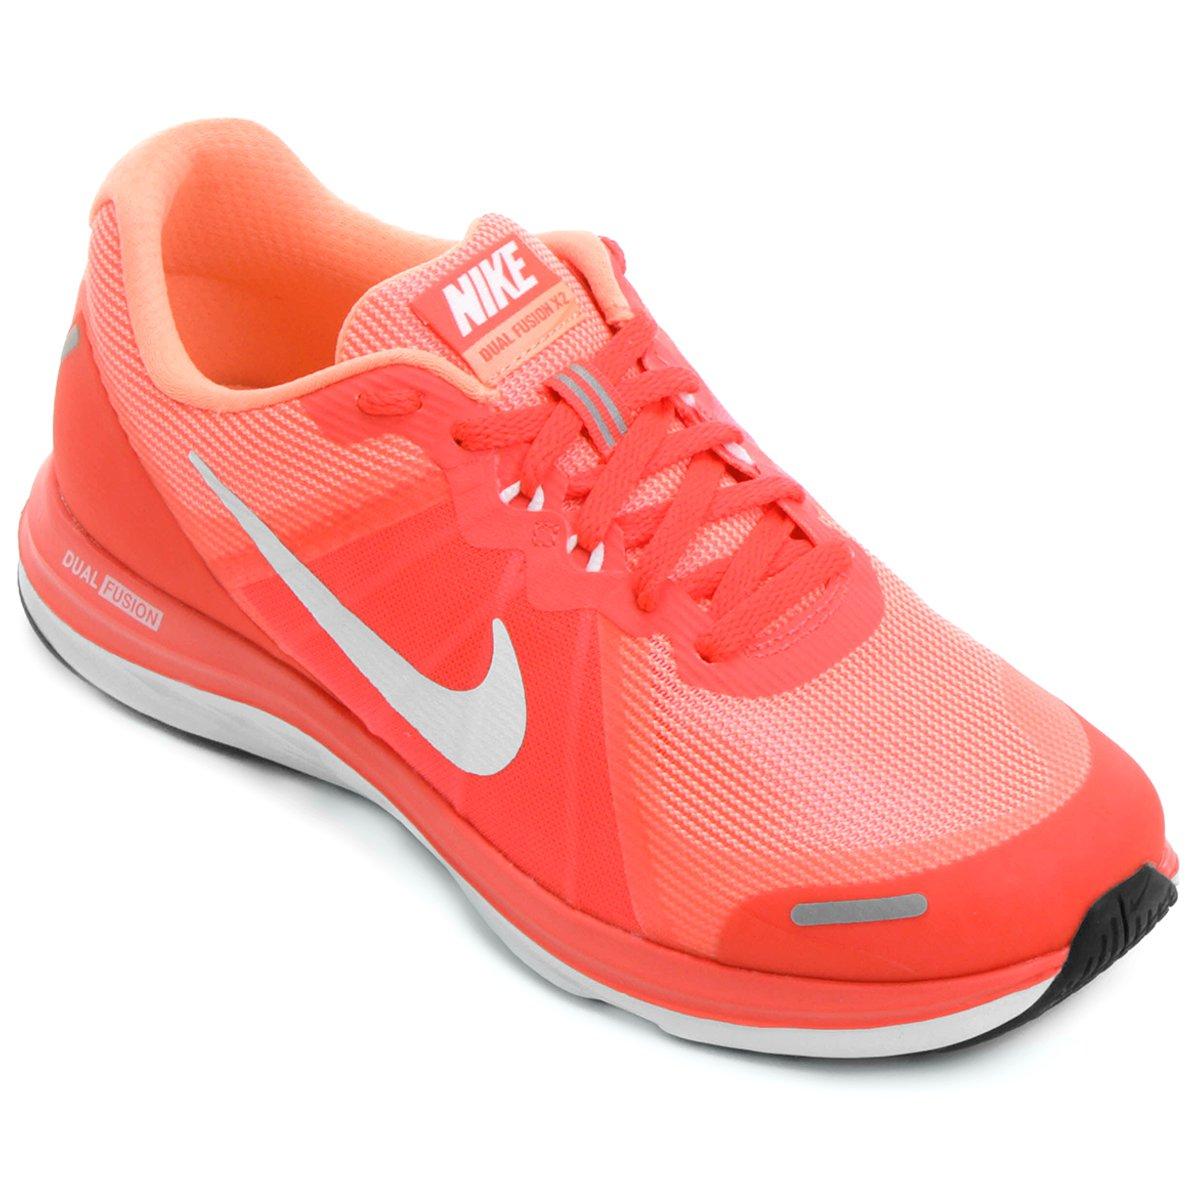 Tênis Nike Dual Fusion X 2 Feminino - Compre Agora  6aa447a2de3f8